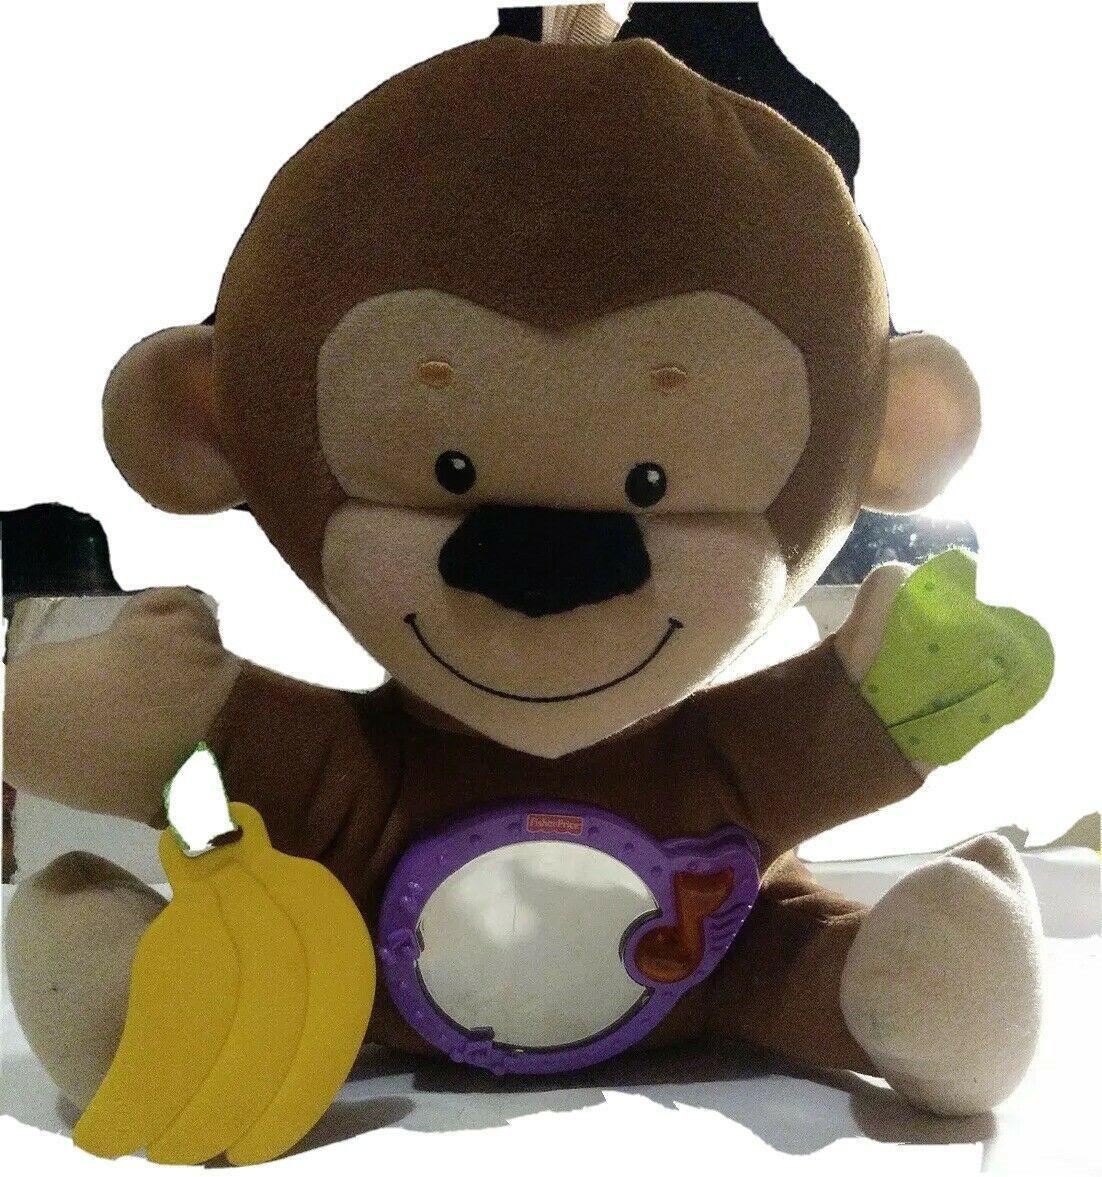 Fisher Price SnugaMonkey Monkey Music Lights Sleep Soother Plush Toy R7879 2009 - $14.84